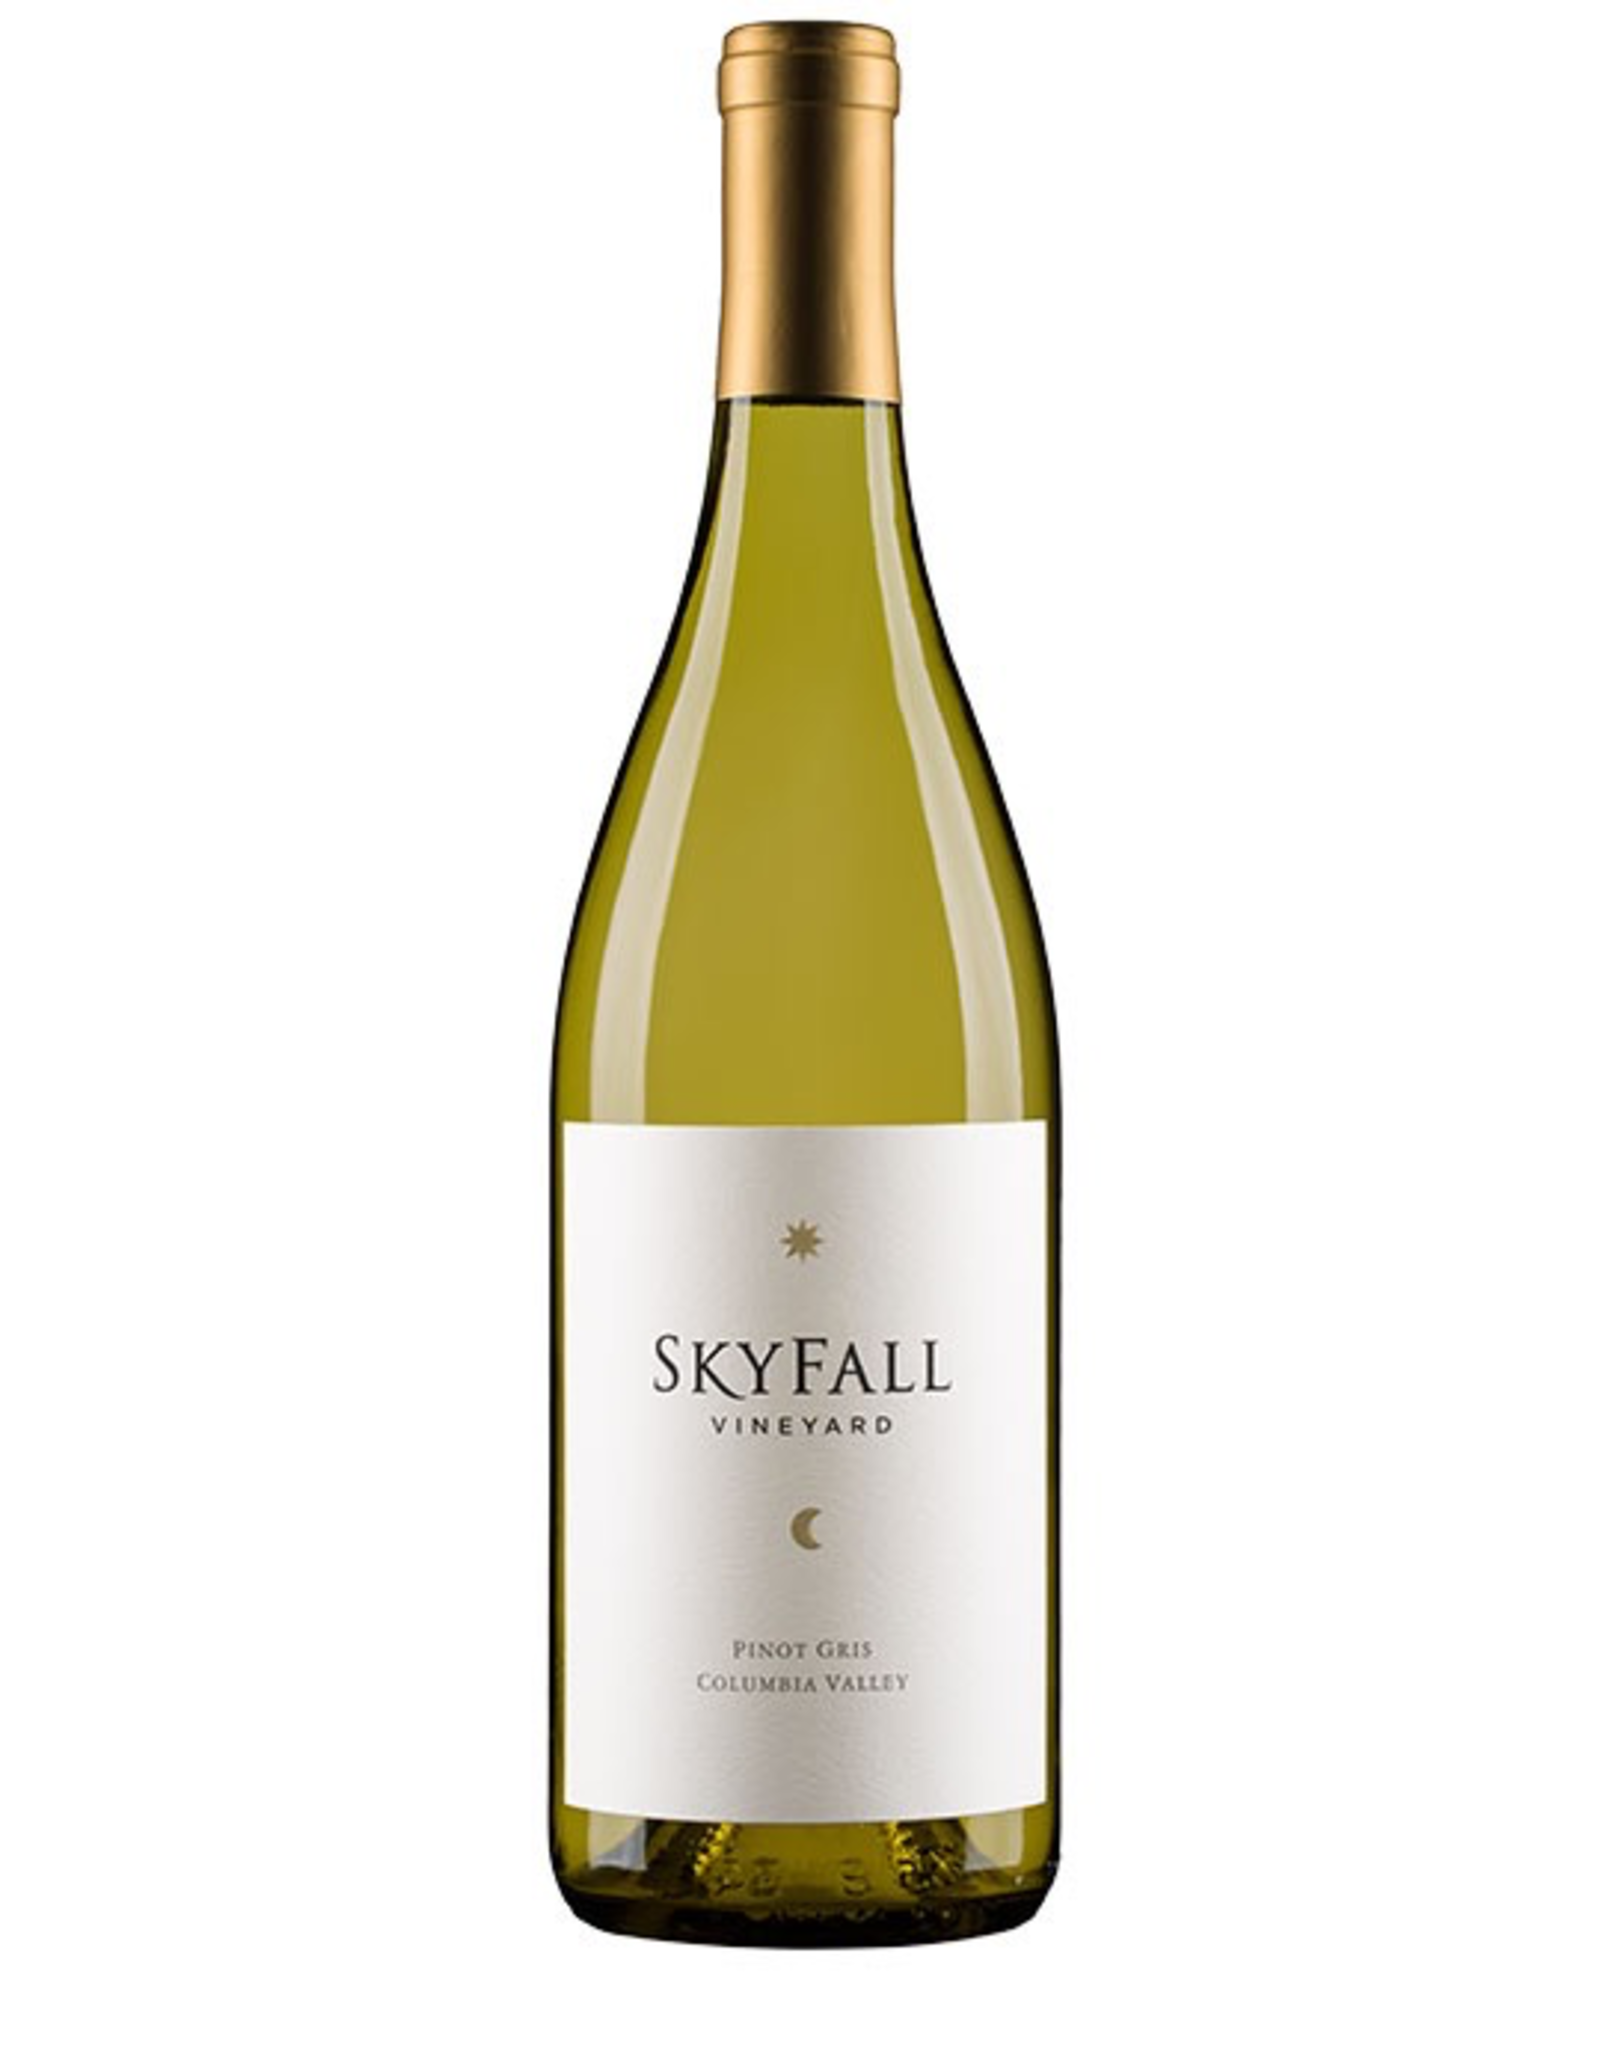 White Wine 2017, Skyfall, Pinot Gris, Multi-regional Blend, Columbia Valley, Washington, 13.0% Alc, CTnr, TW88